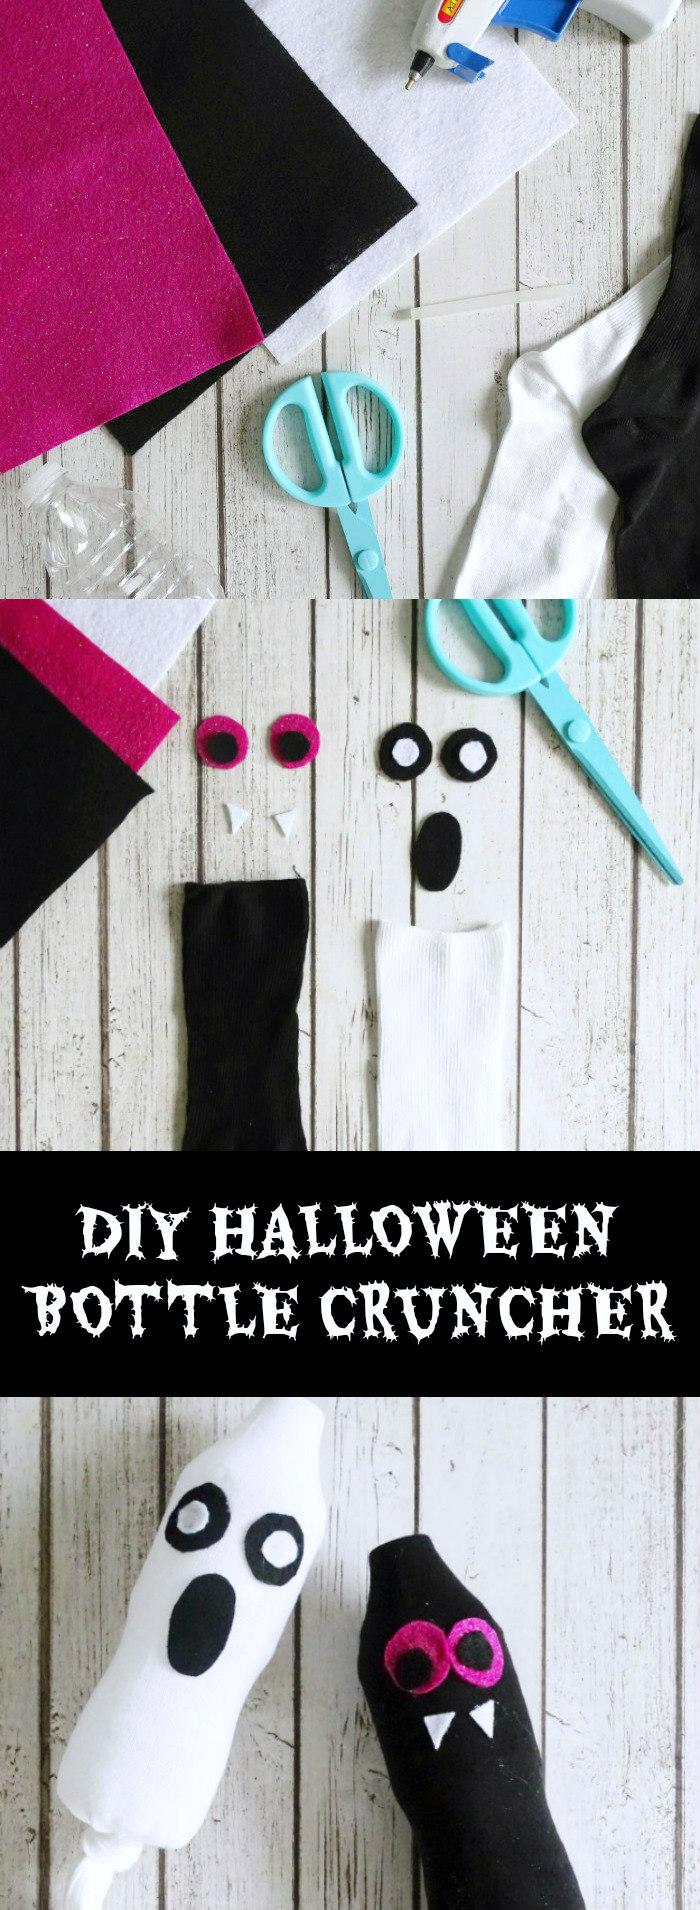 DIY Halloween Bottle Crunchers